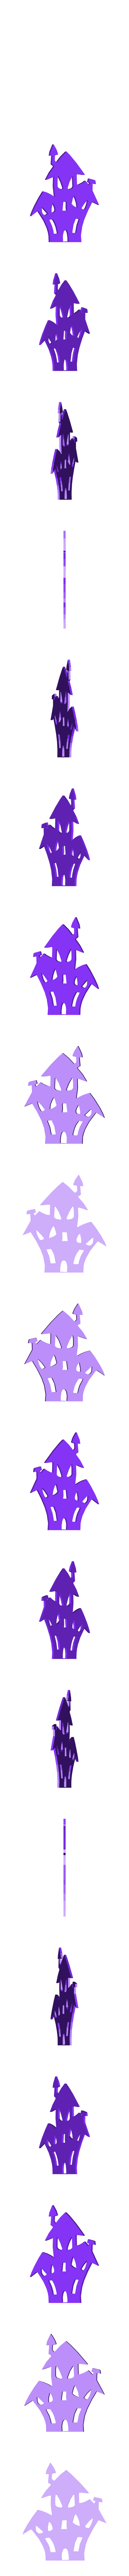 maison-hantée1.stl Download STL file Halloween (full of wall decoration) • 3D print model, catf3d